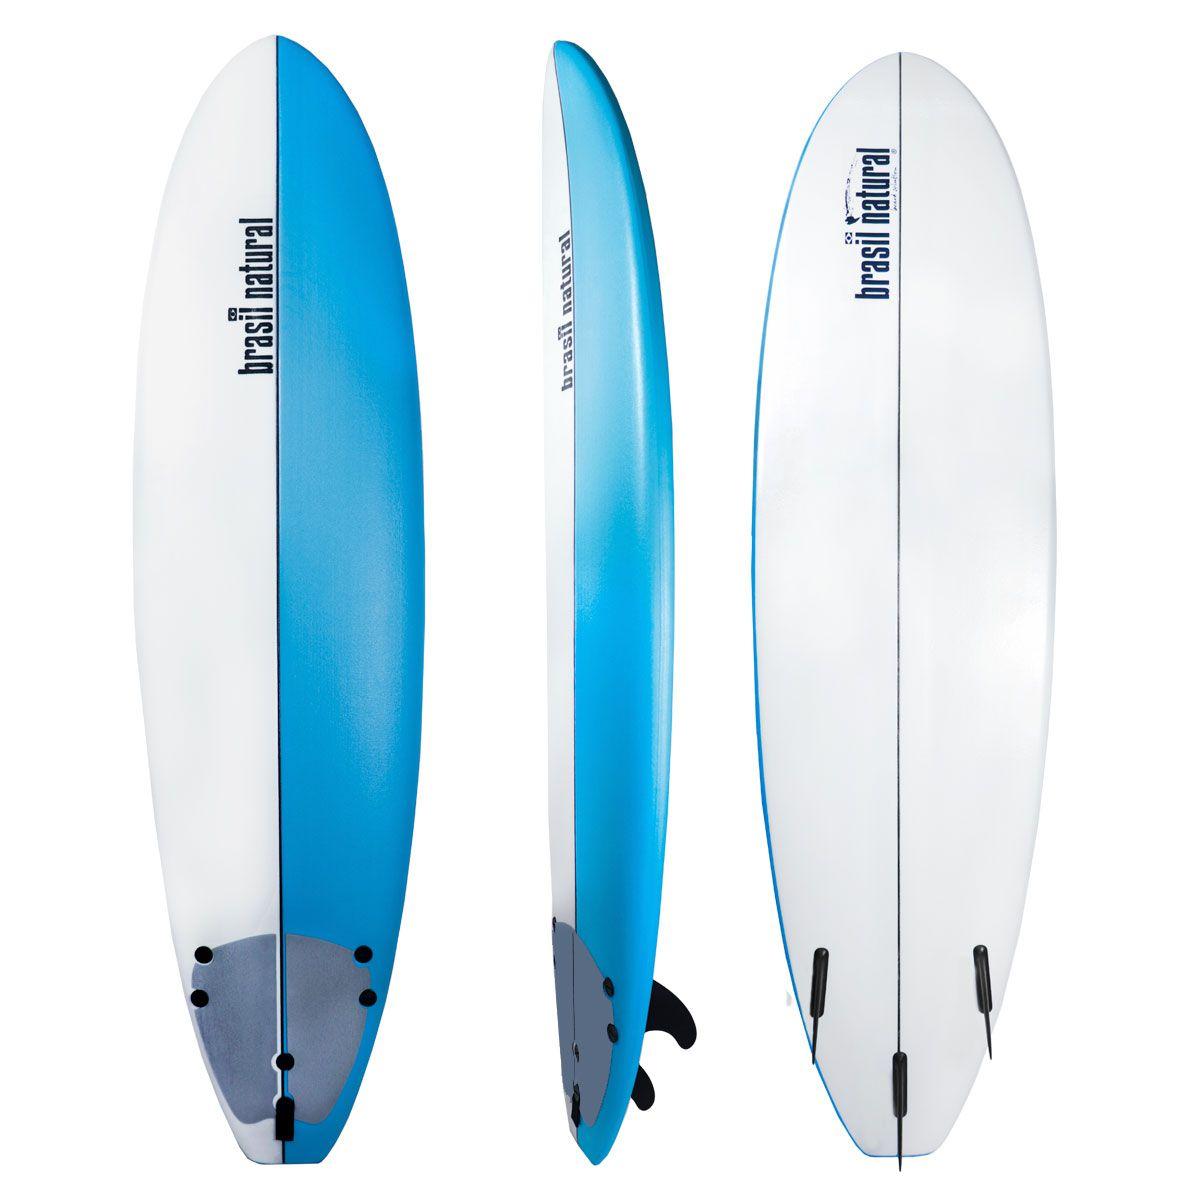 Prancha de surf infantil 5.8 edição limitada+ kit surf - Brasil Natural